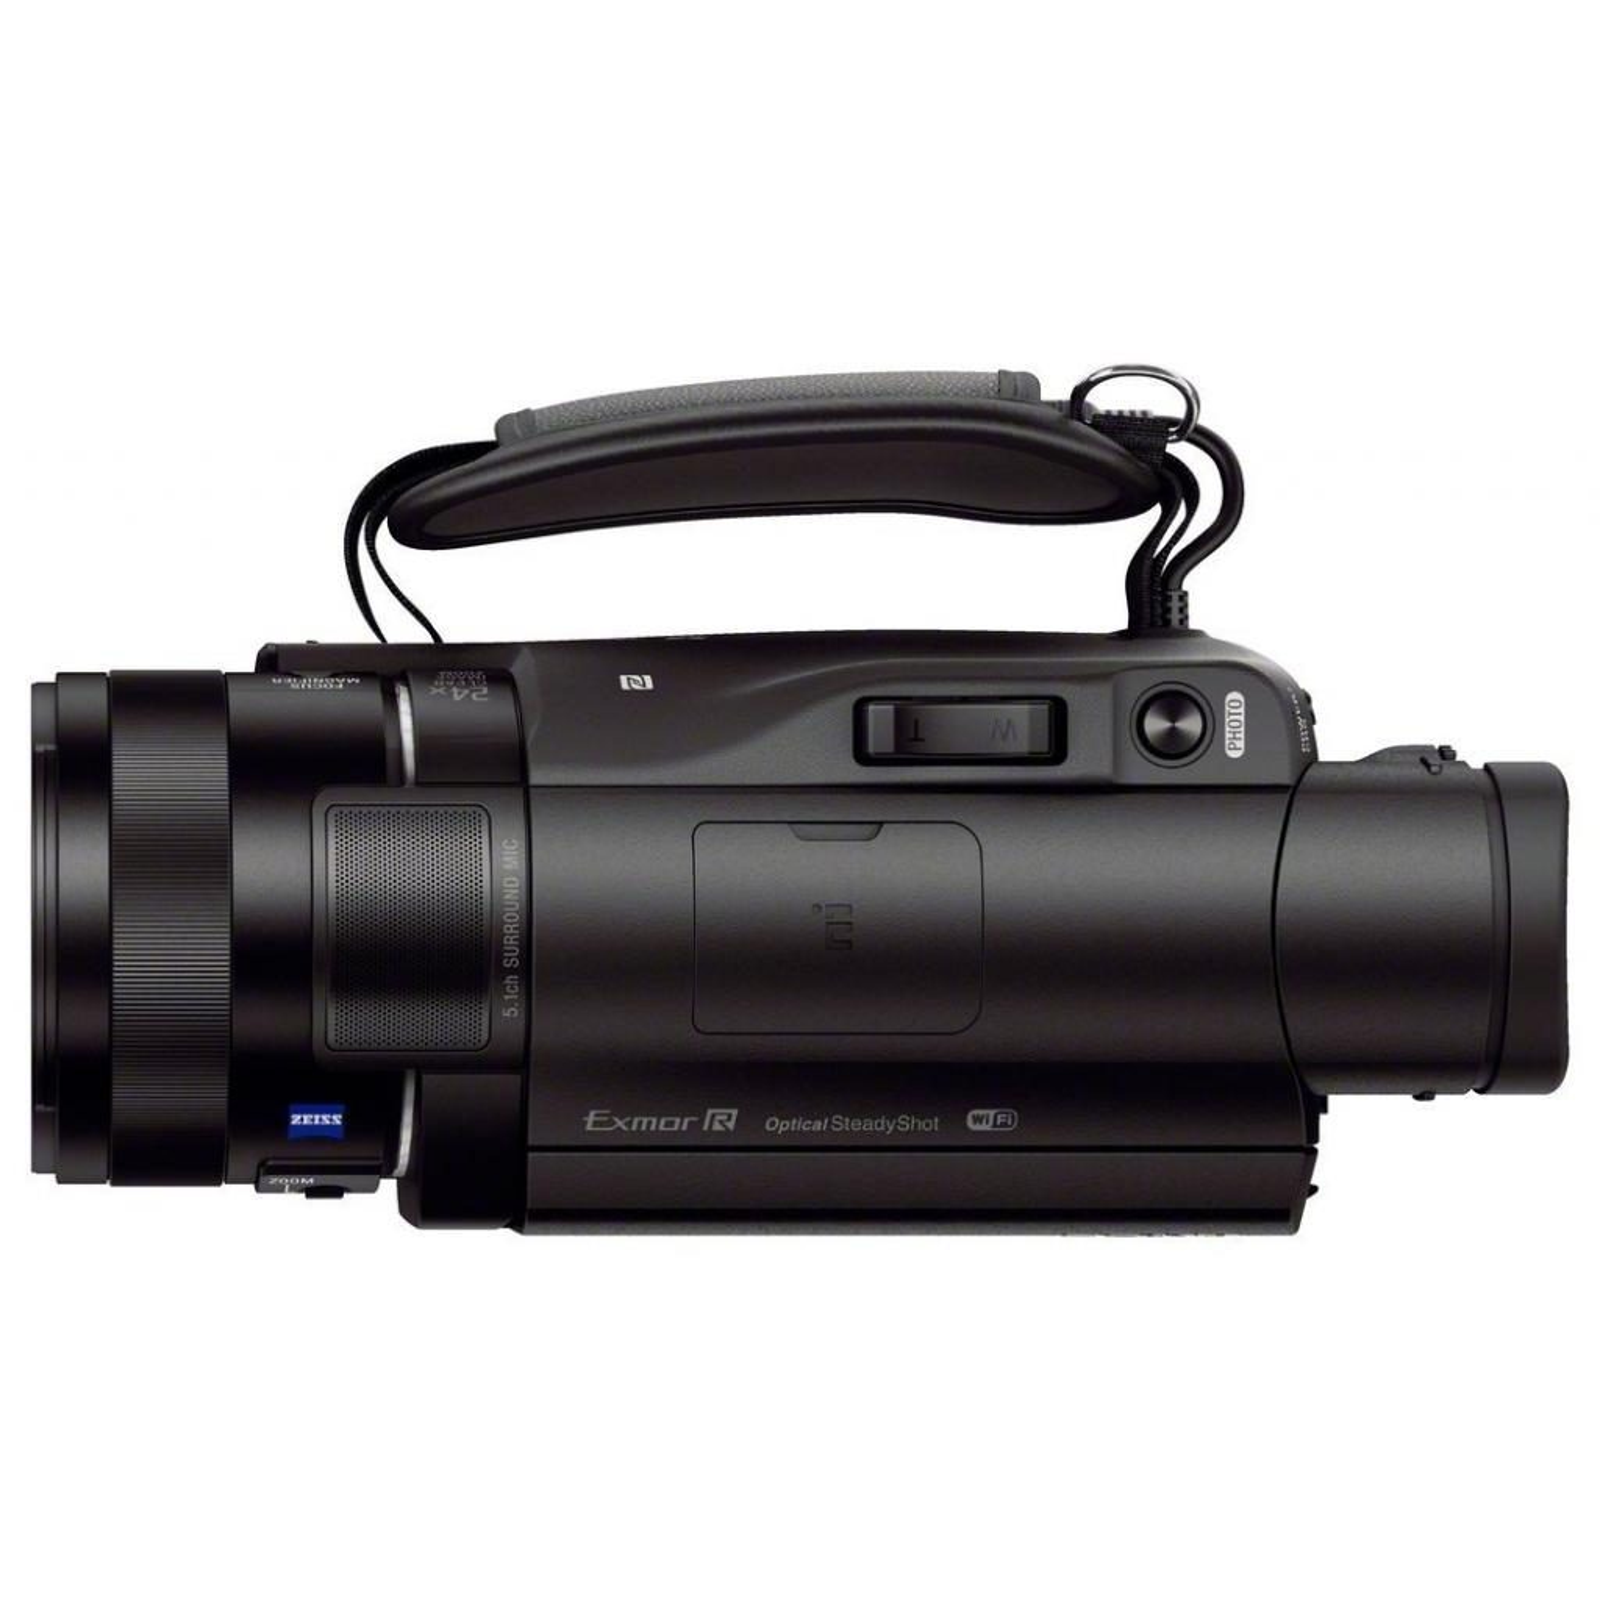 Цифровая видеокамера SONY Handycam HDR-CX900 Black (HDRCX900EB.CEN) изображение 9